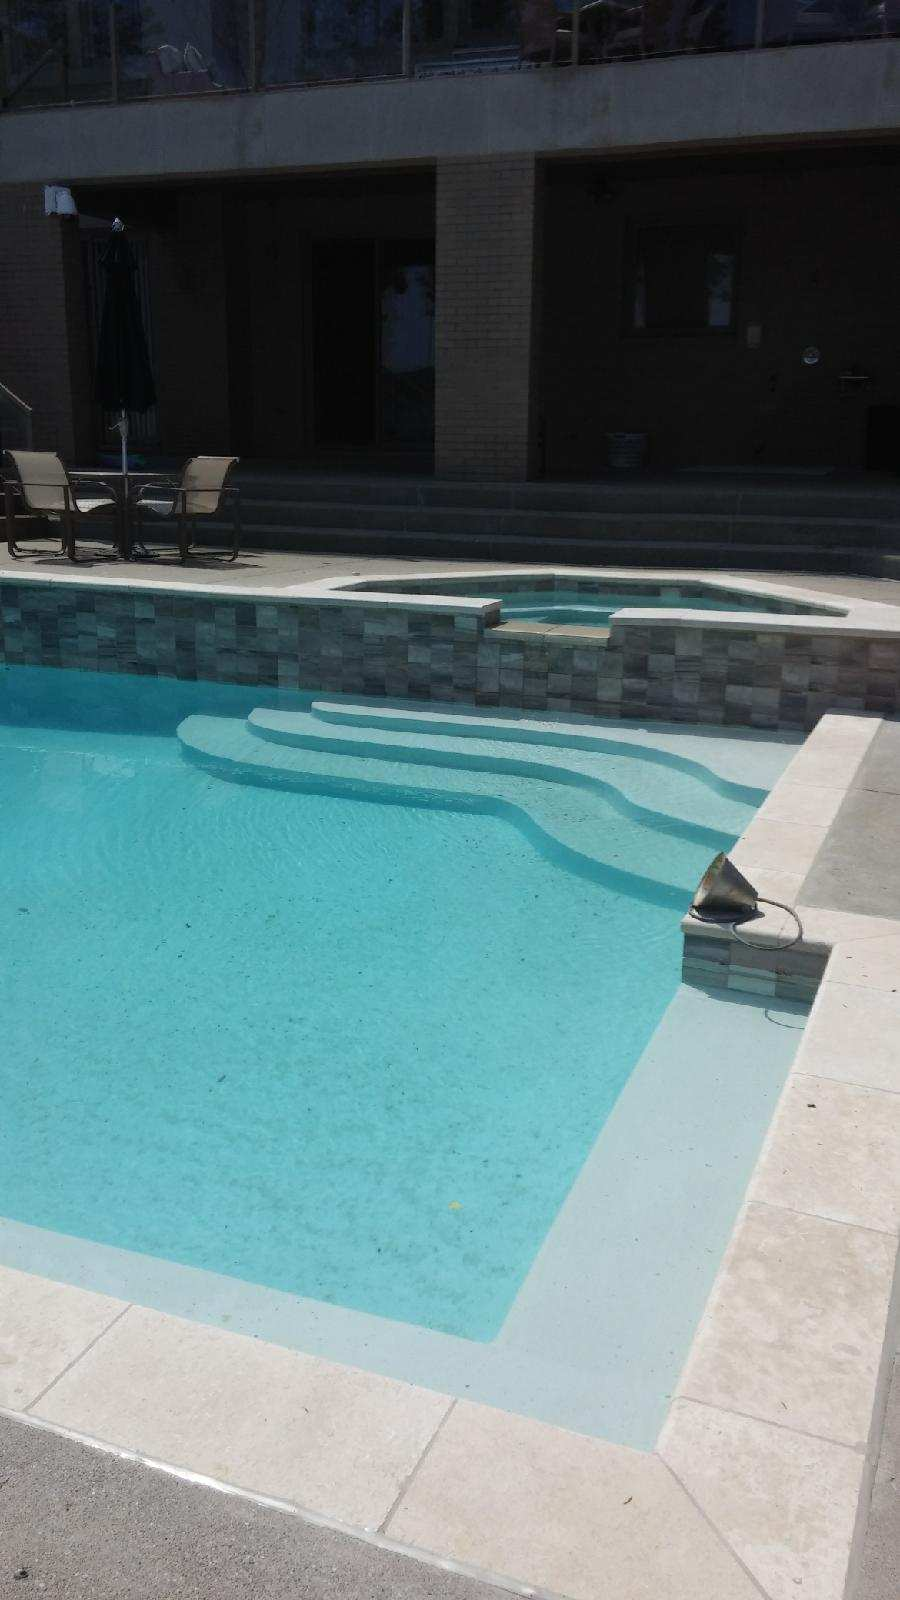 prestige-pools_michigan_pool-remodel_pool-renovation_new-pool_6.jpg